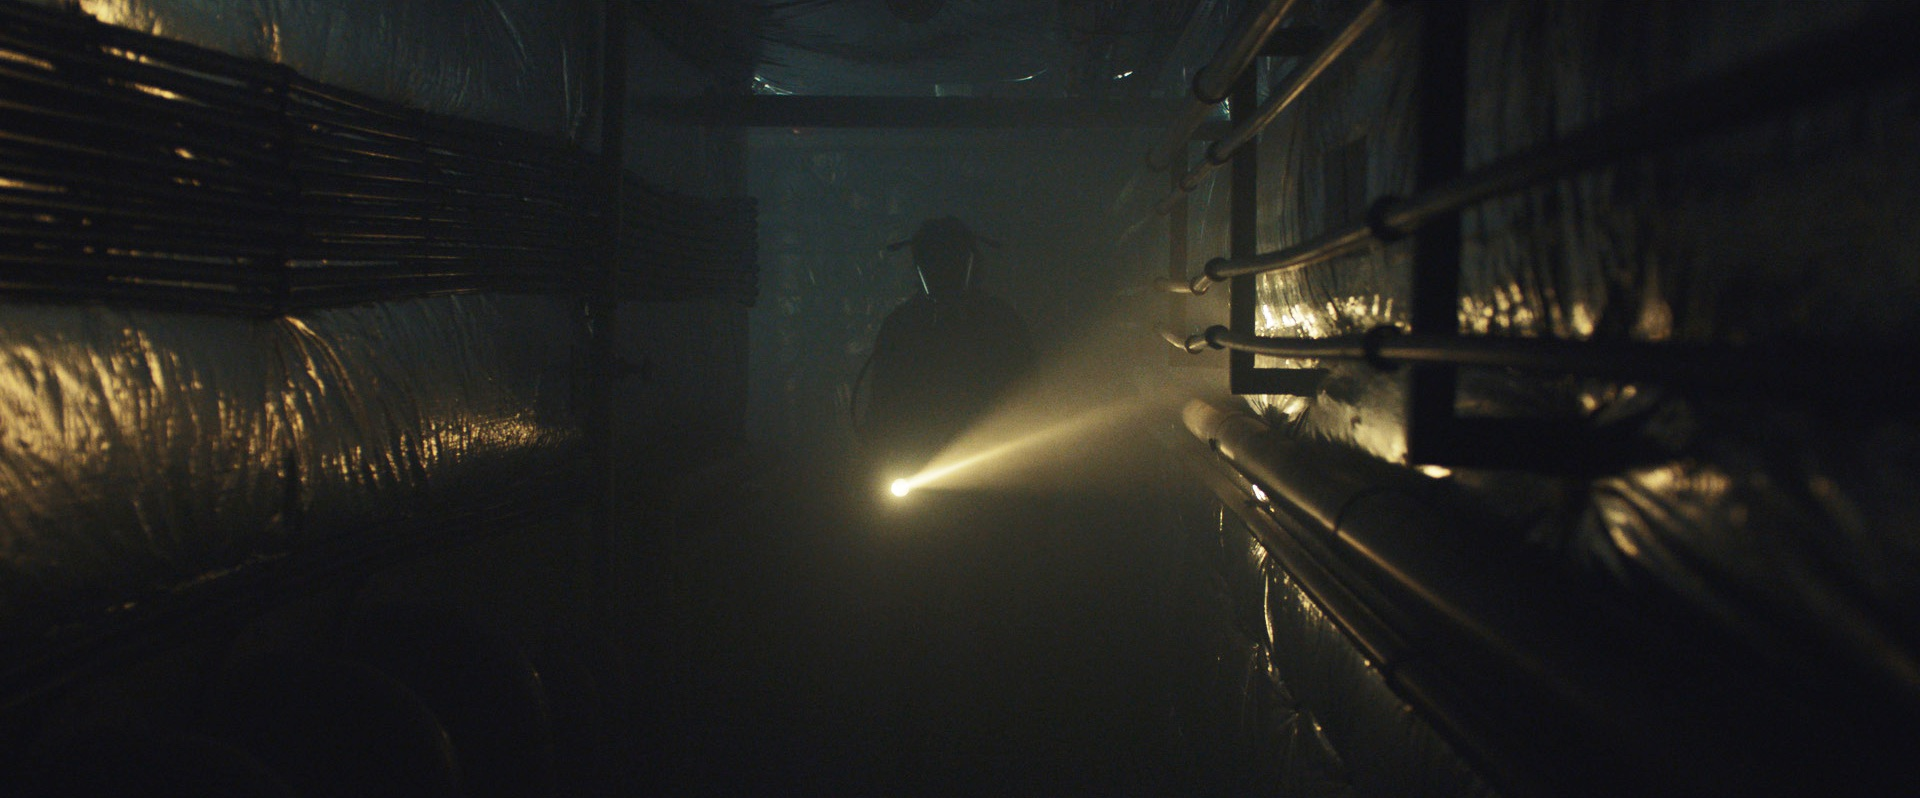 "DP Romain Lacourbas Talks About Color Grading on Set of ""ZeroZeroZero"""